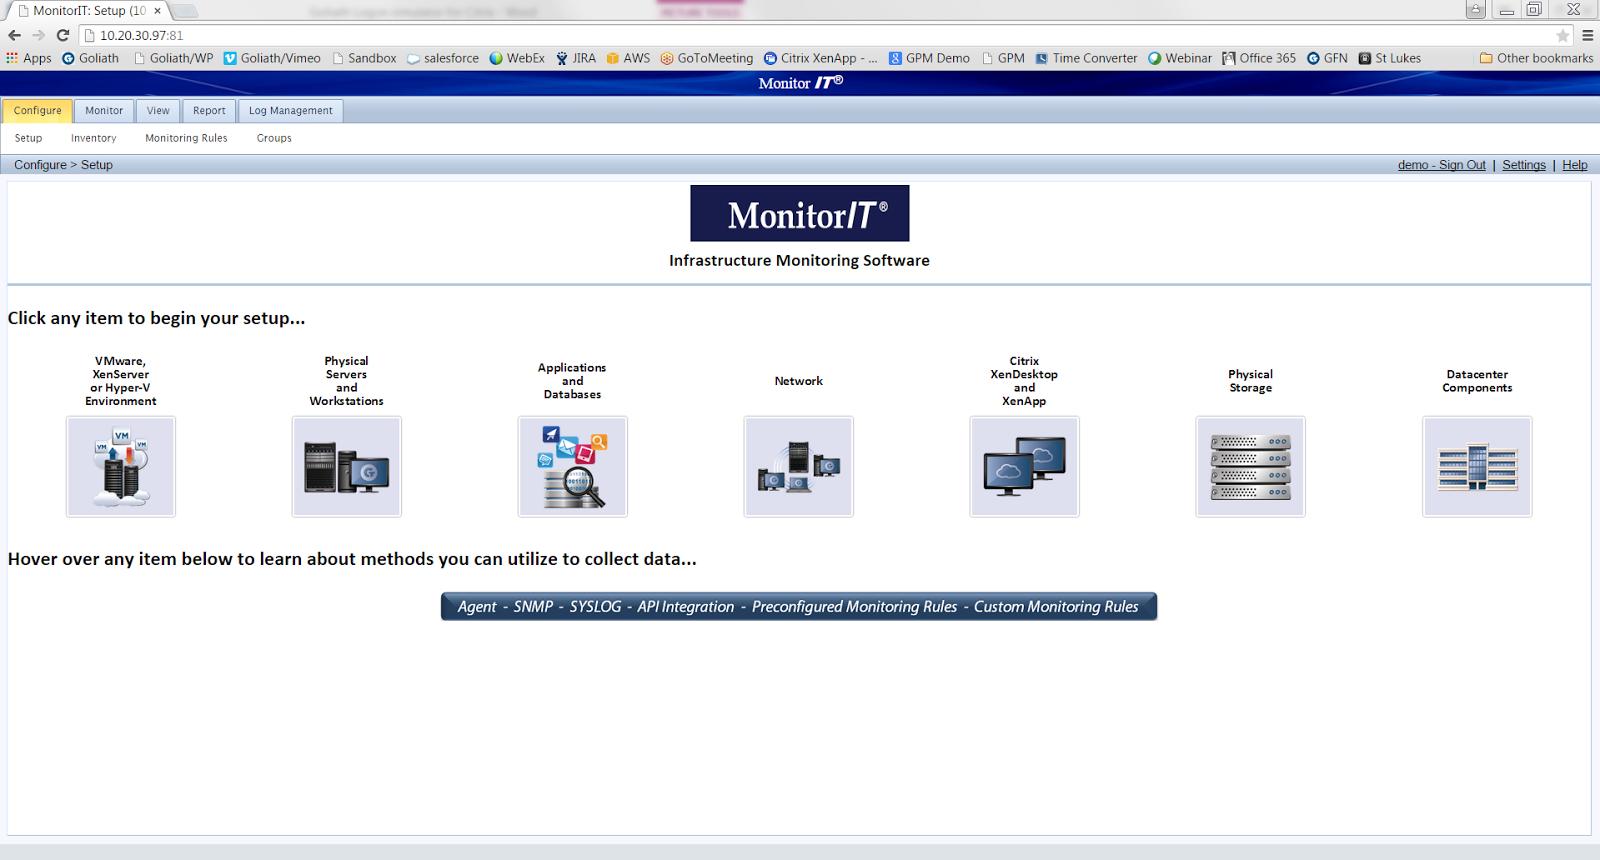 Goliath Logon simulator for Citrix - robbeekmans net